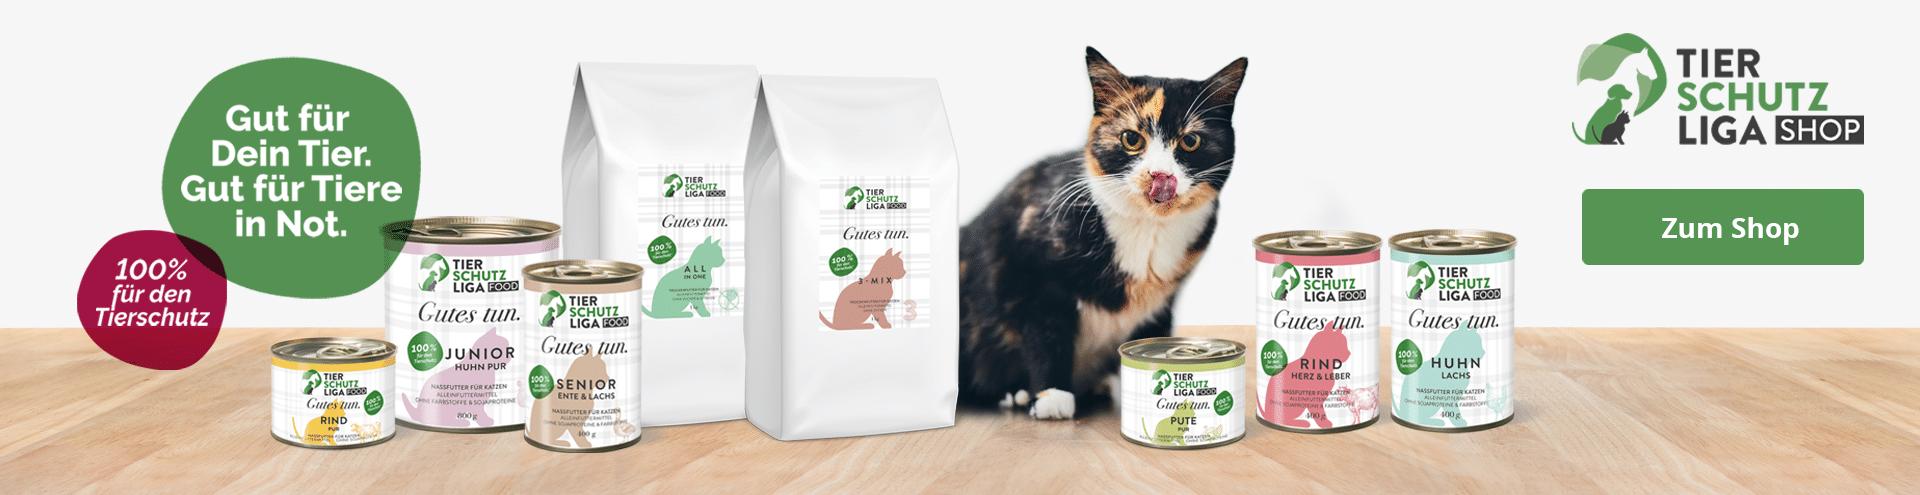 Startseite-Stiftung-Header-Katze Katzenstation Netzschkau